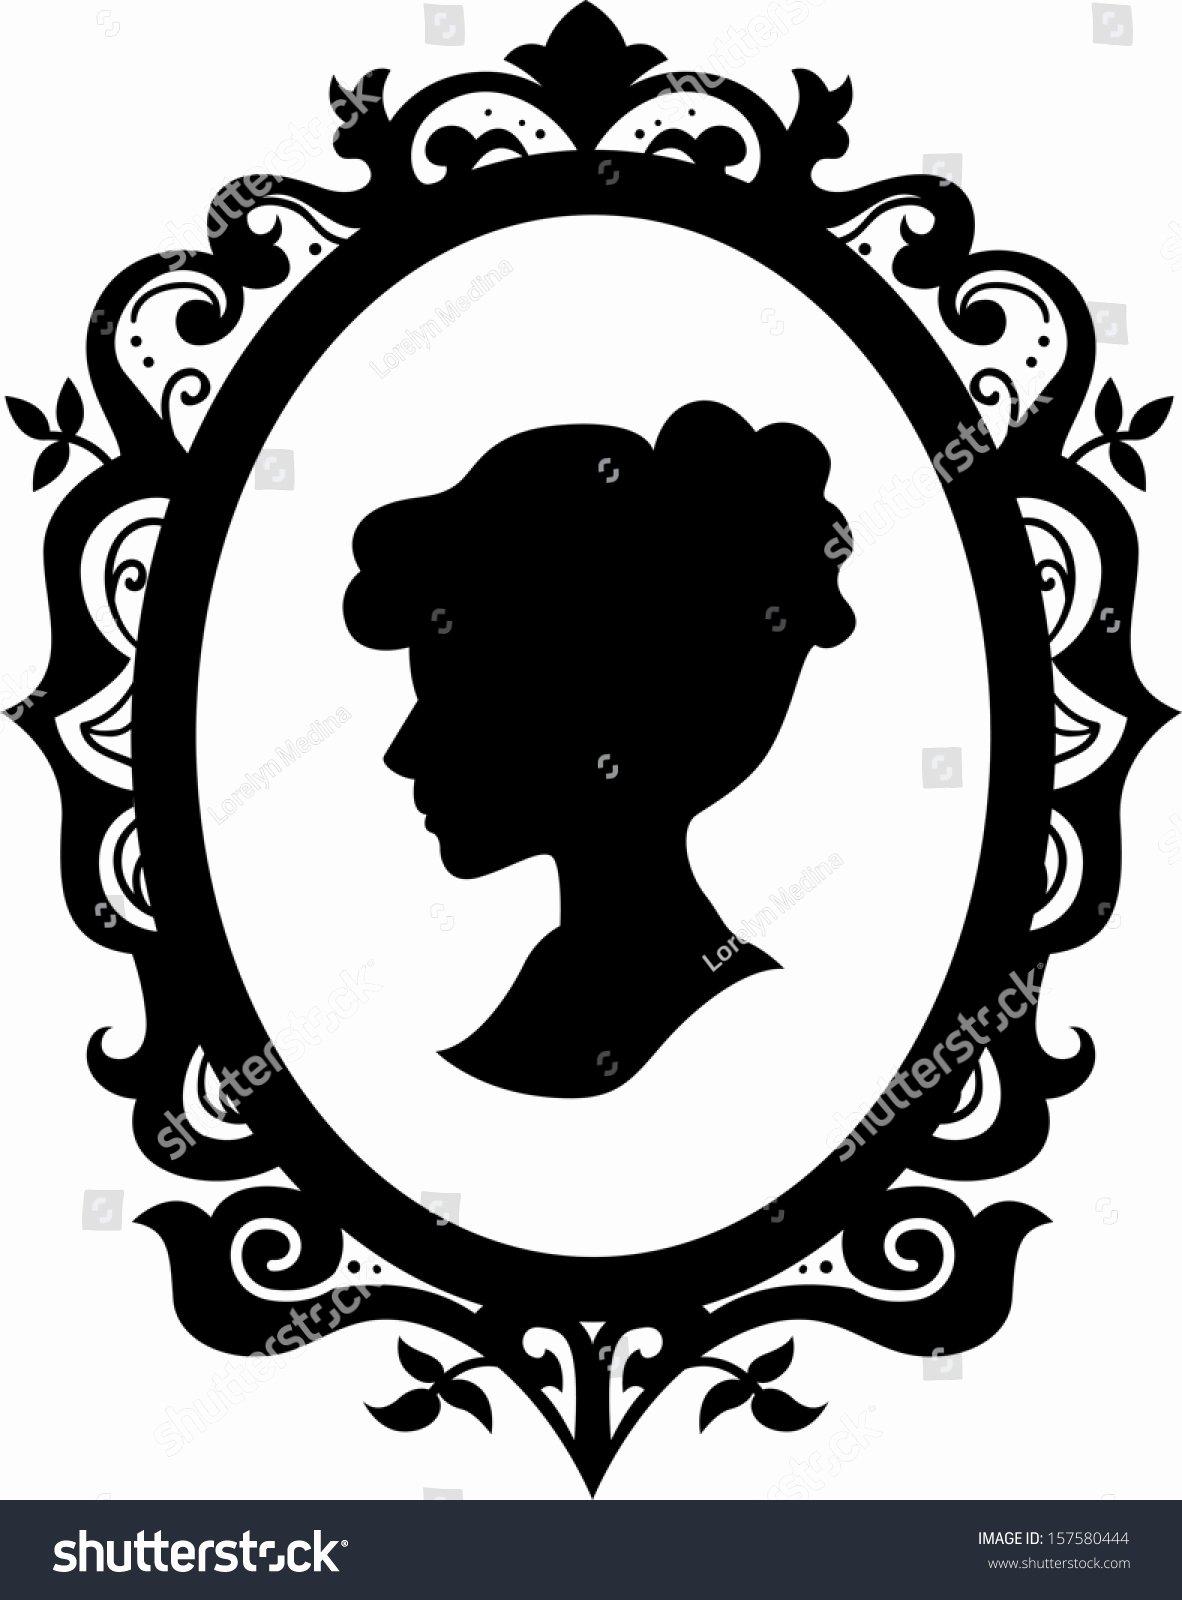 Black and White Illustration Unique Black White Illustration Cameo Featuring Silhouette Stock Vector Shutterstock